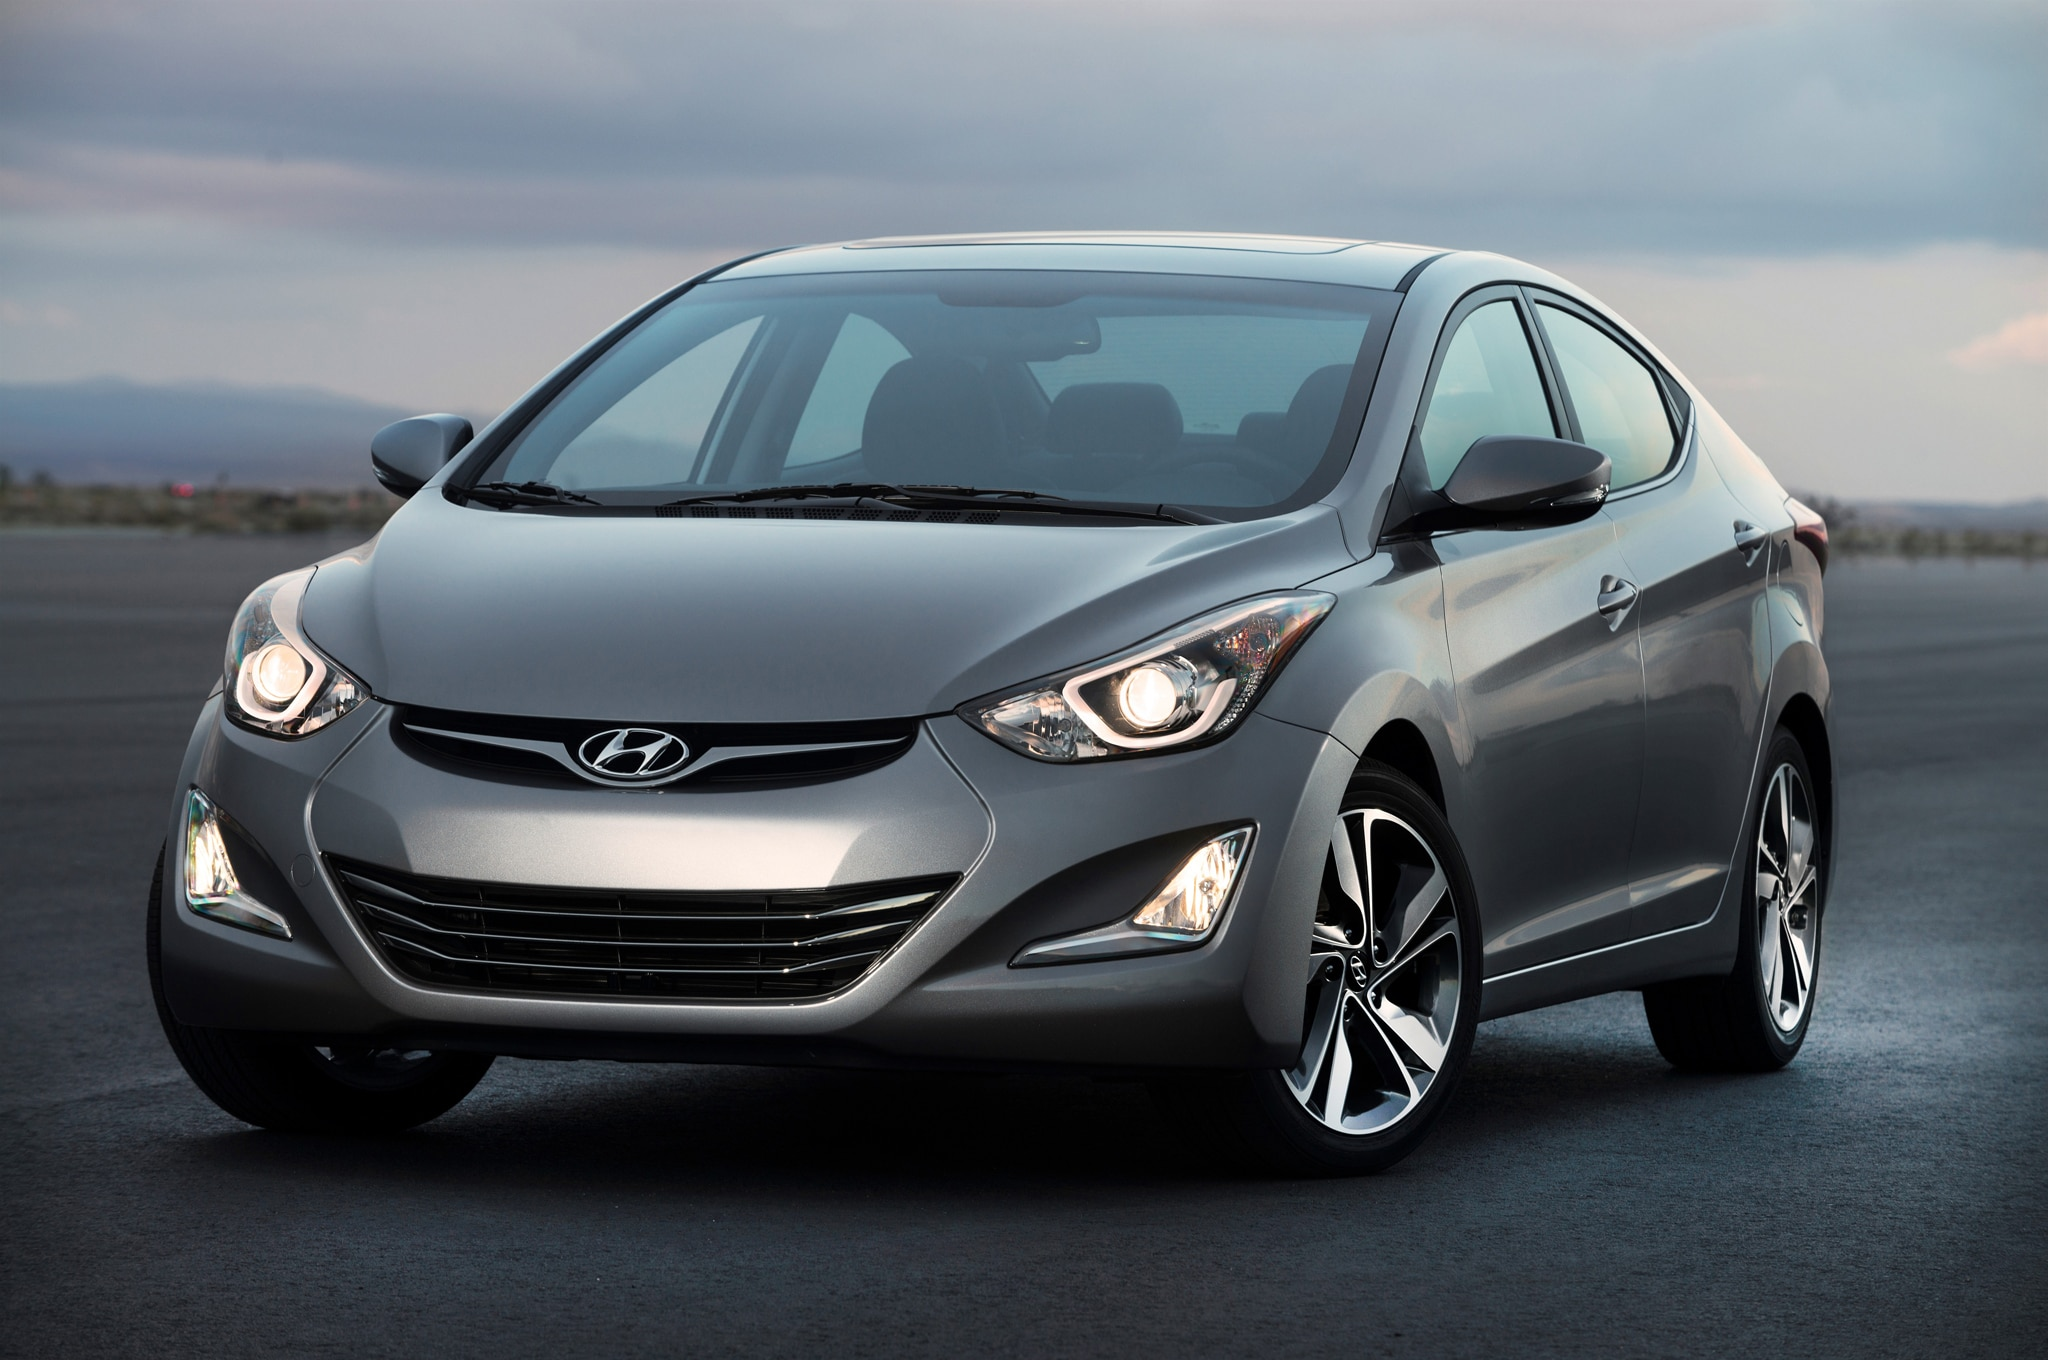 2015 Hyundai Elantra. 39|122